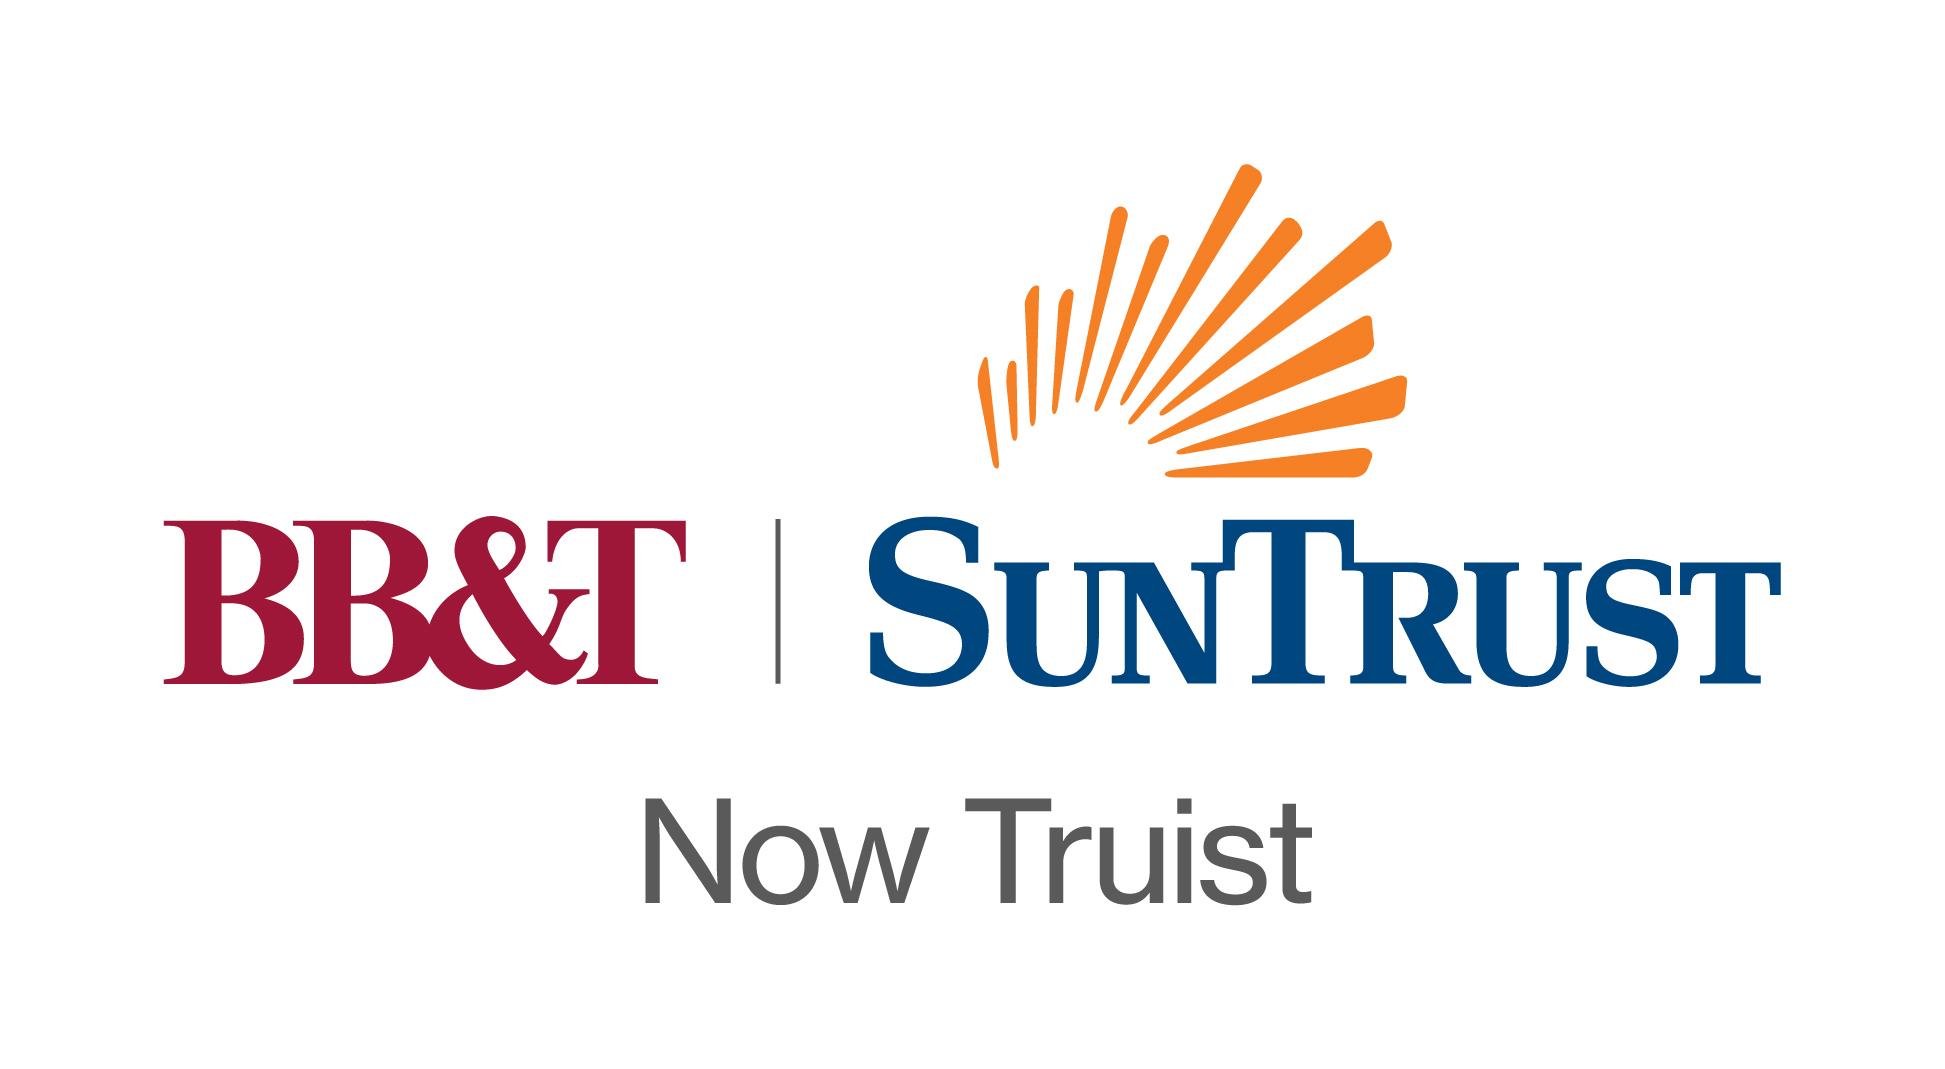 BB&T-SunTrust Truist